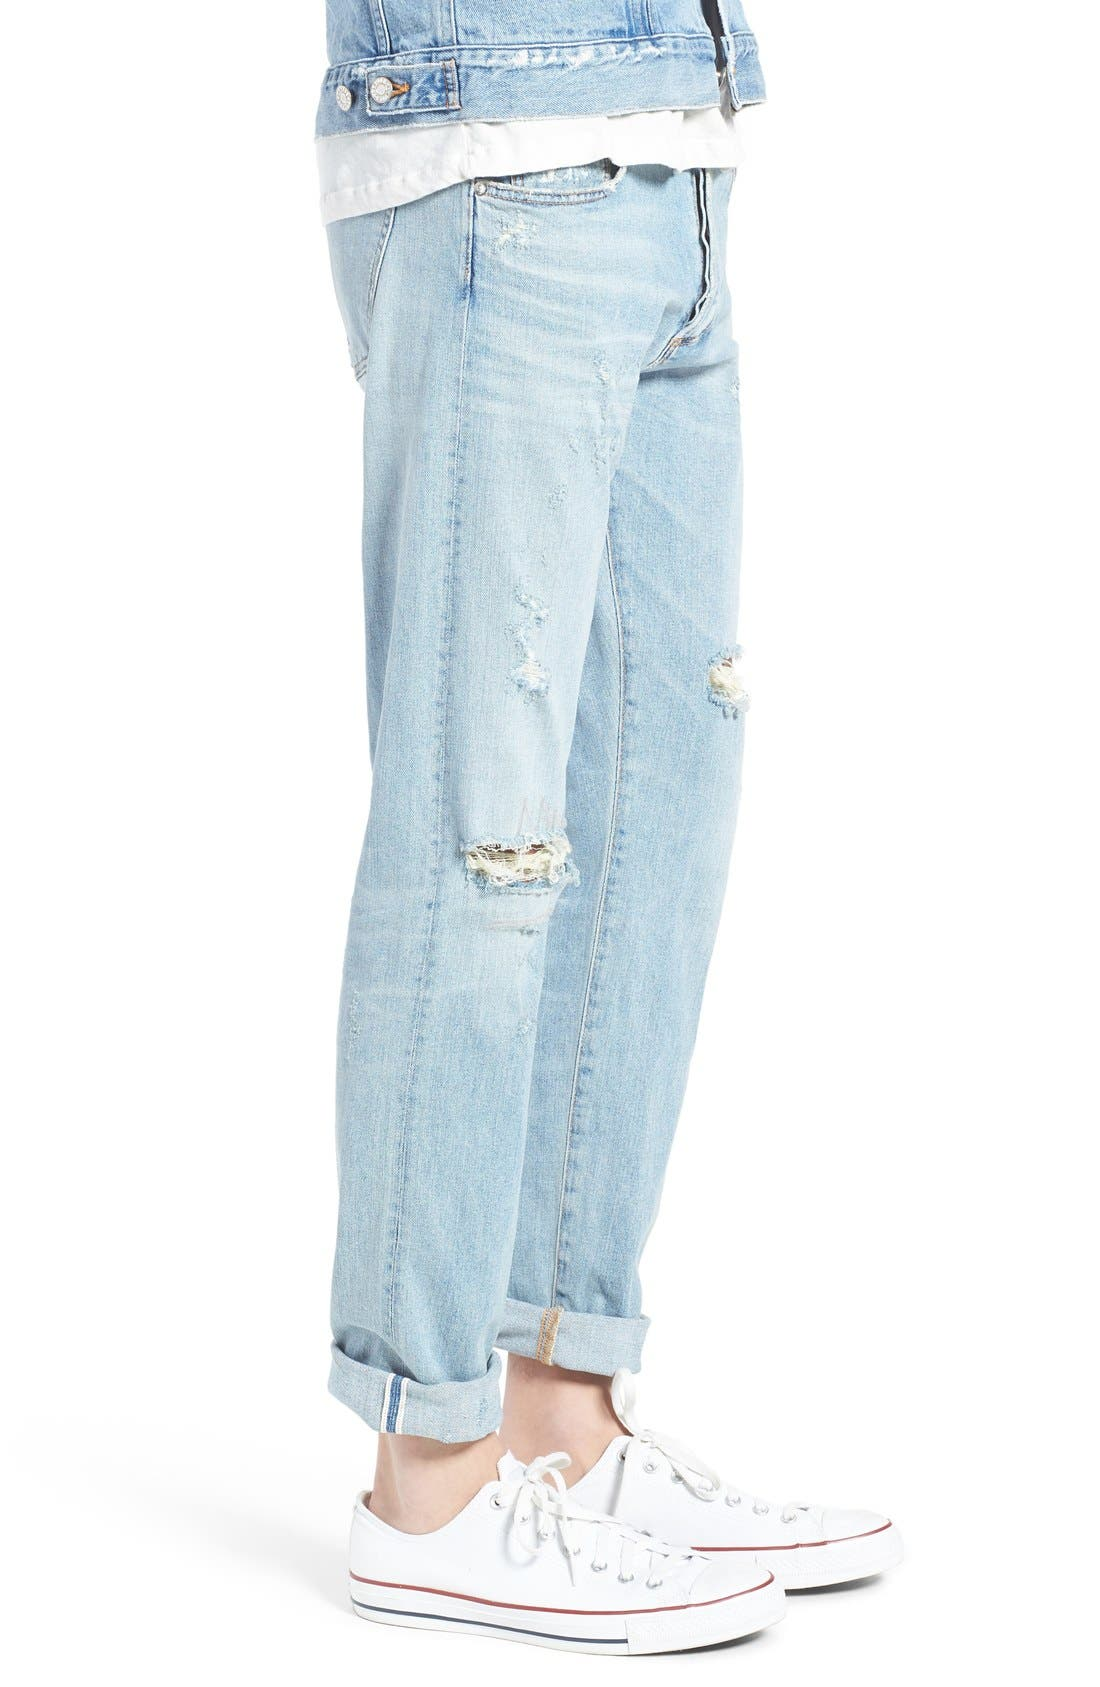 Alternate Image 3  - AGOLDE Skinny Fit Distressed Jeans (Pixx) (Men)